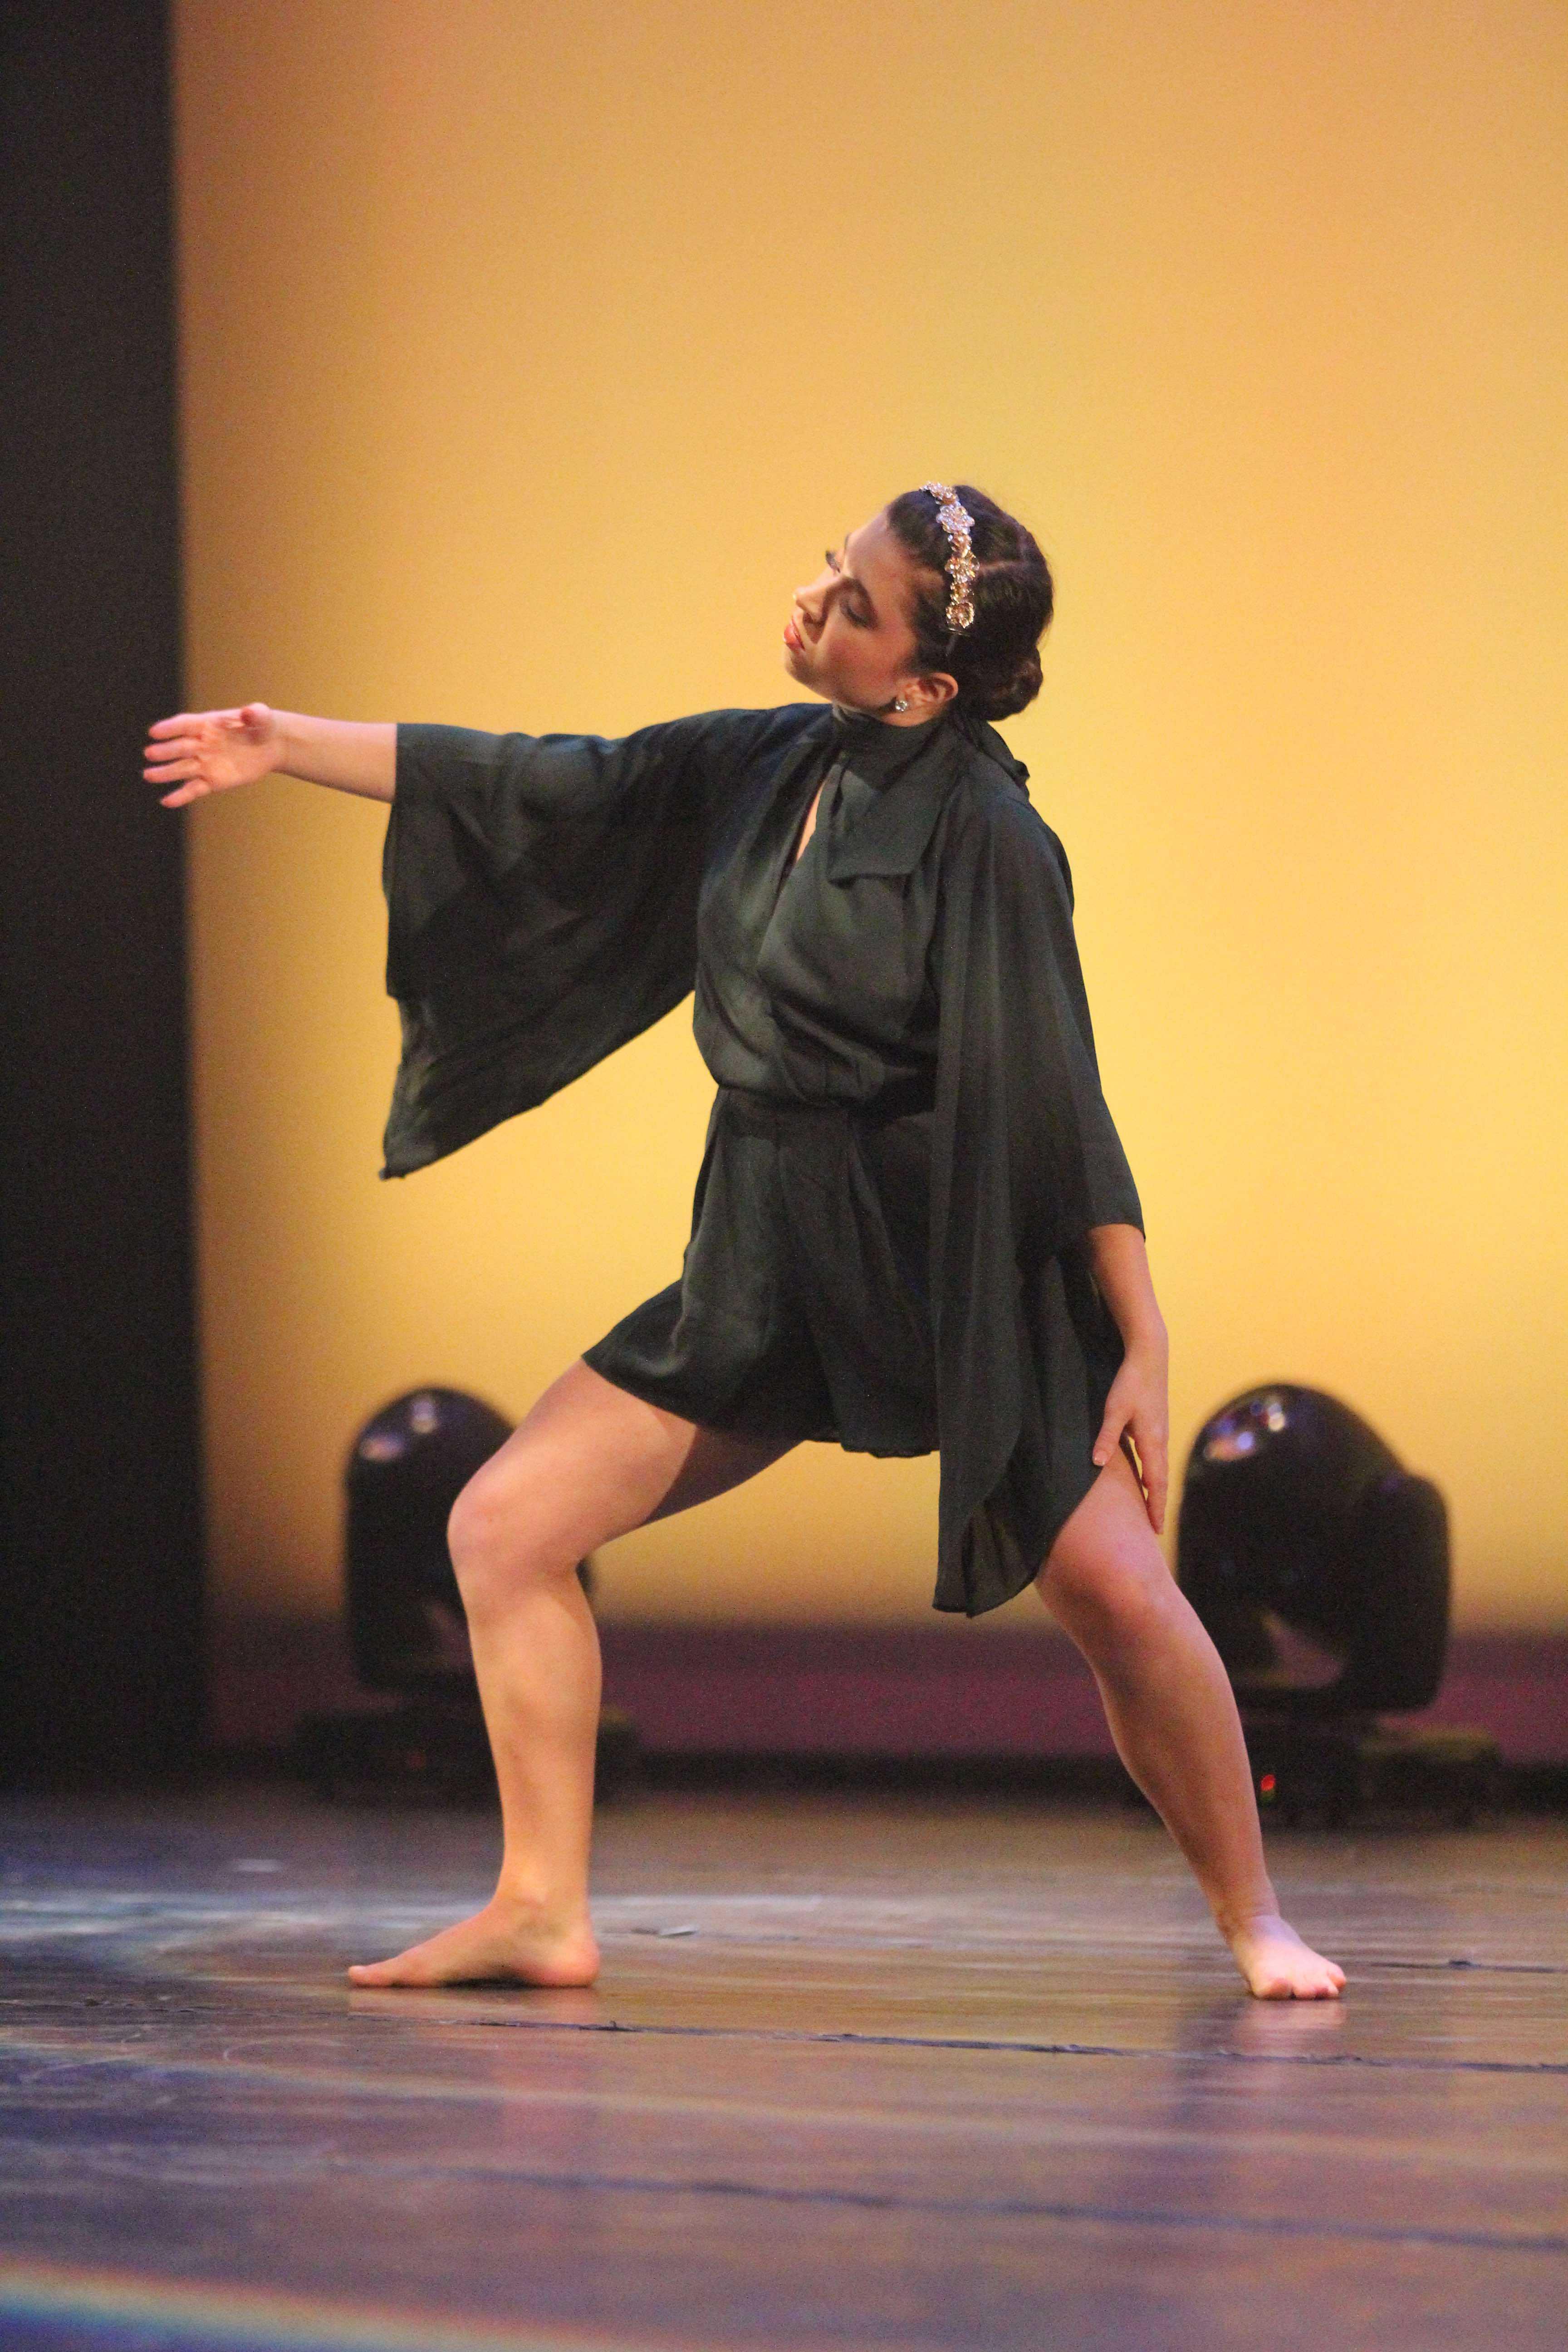 Faith+Kubala+%2717+dances+to+her+piece.